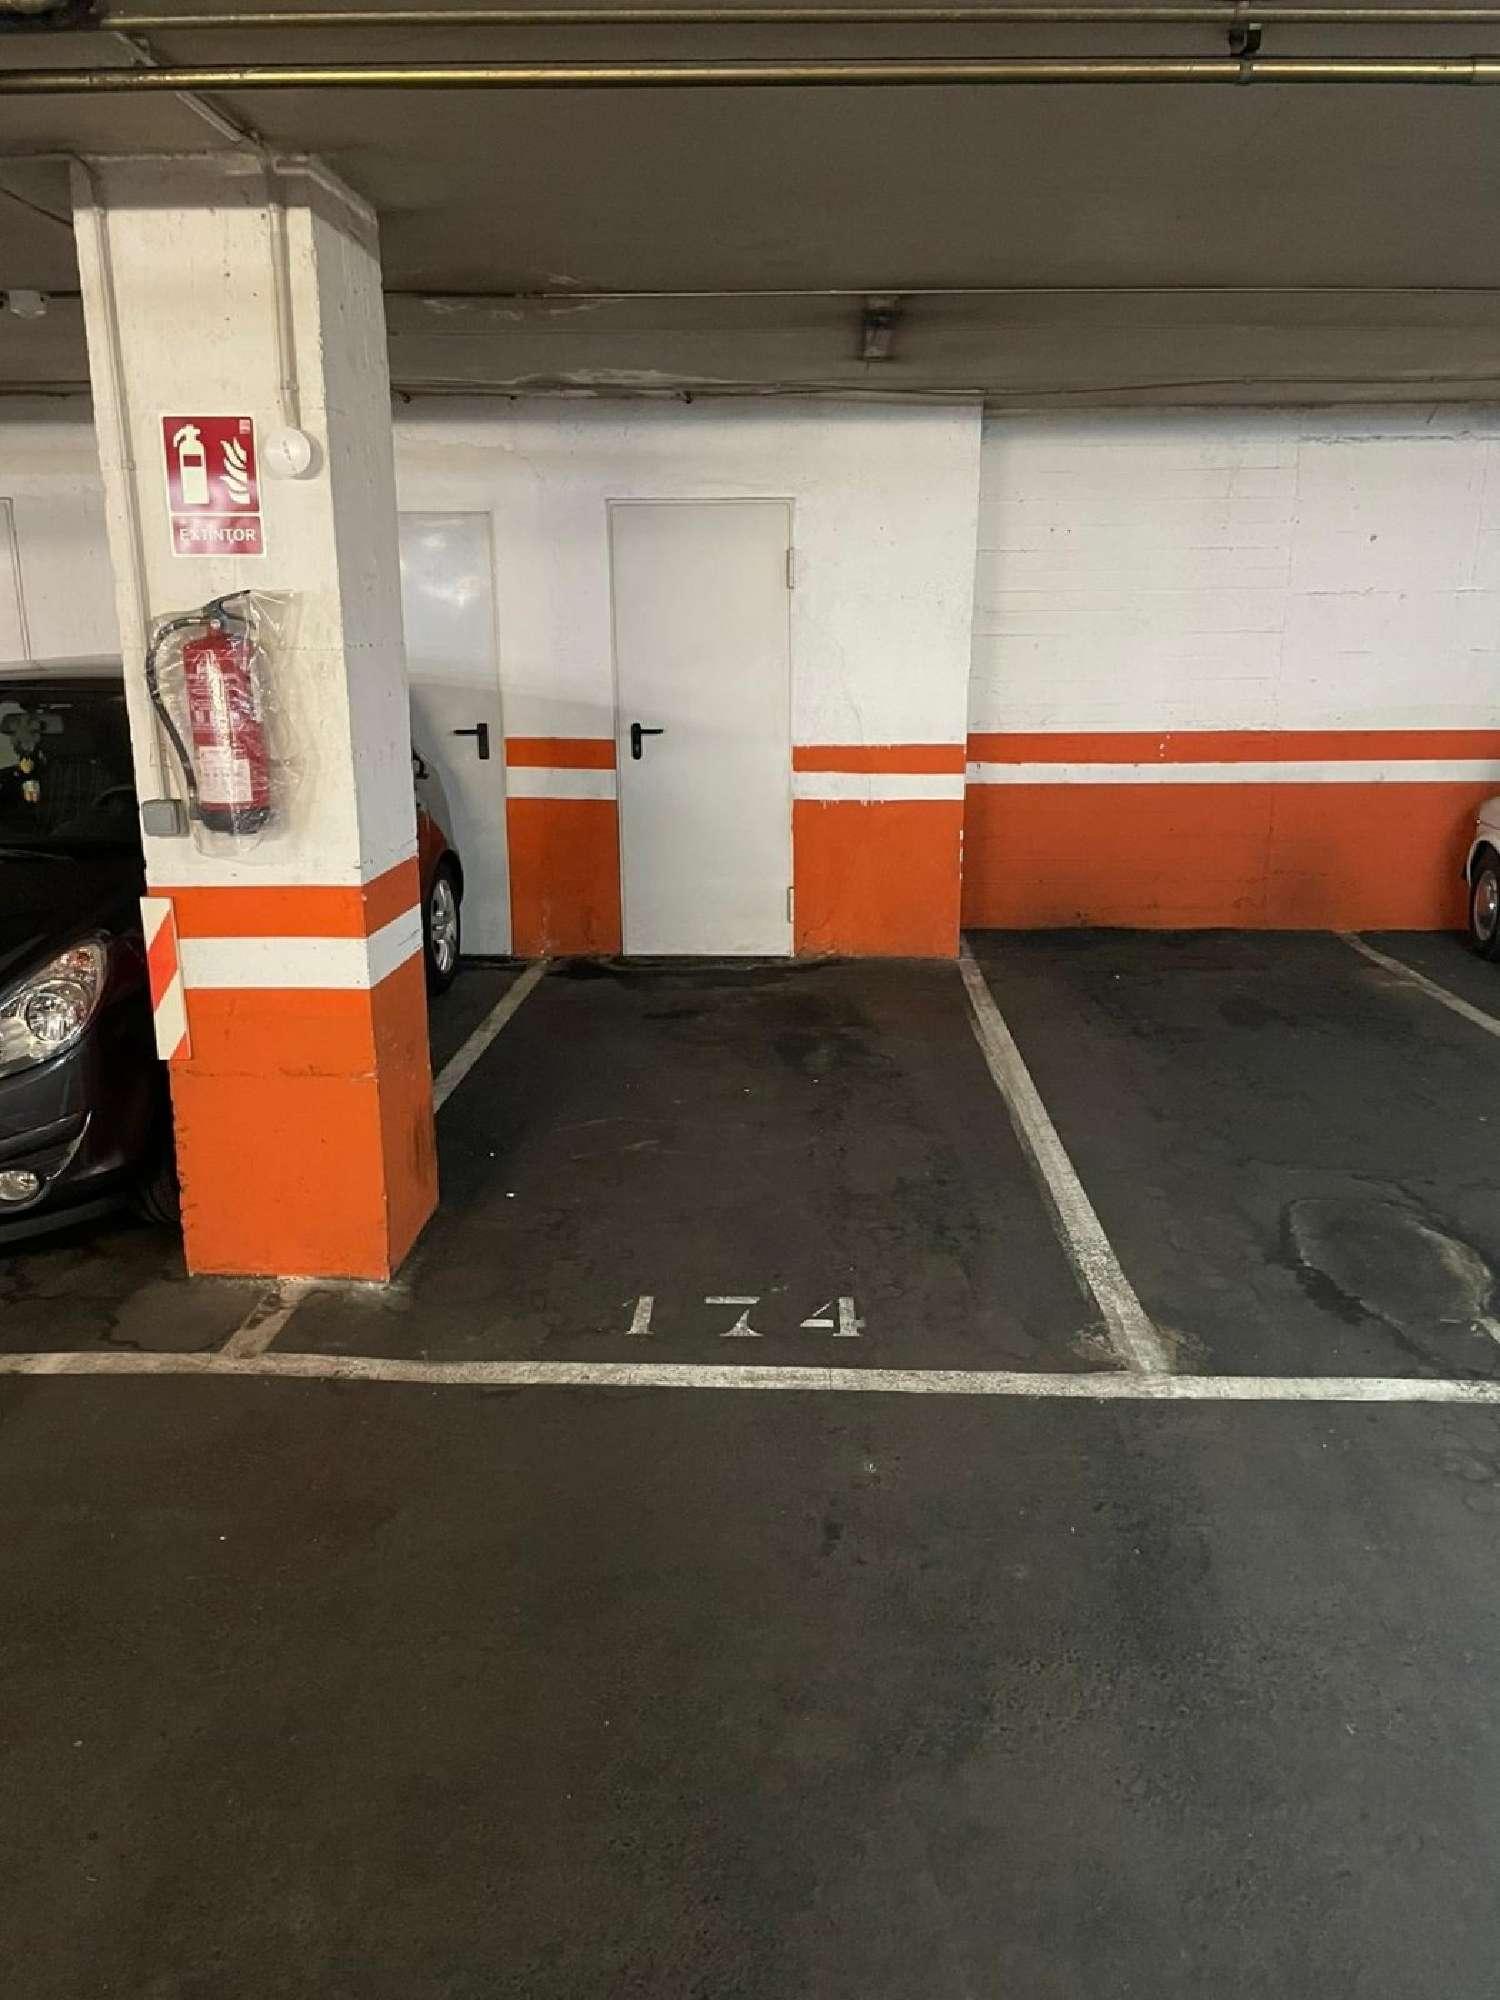 nou barris-la guineueta barcelona aparcamiento foto 4596743